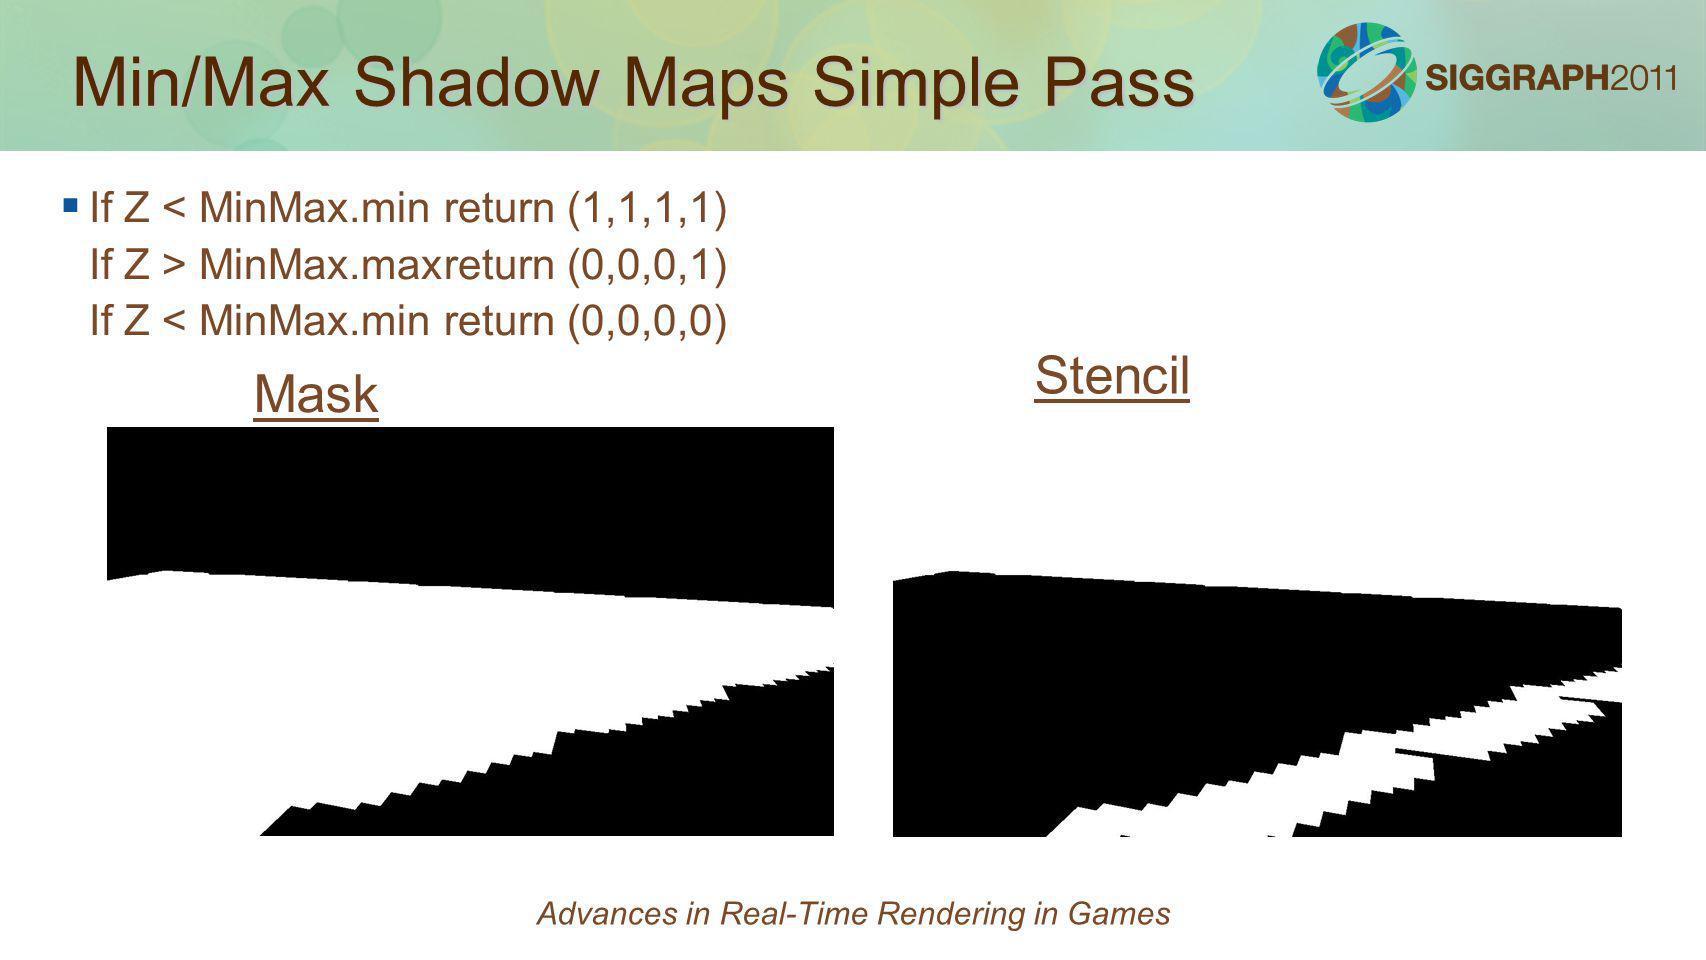 Min/Max Shadow Maps Simple Pass If Z MinMax.maxreturn (0,0,0,1) If Z < MinMax.min return (0,0,0,0) Mask Stencil Advances in Real-Time Rendering in Gam